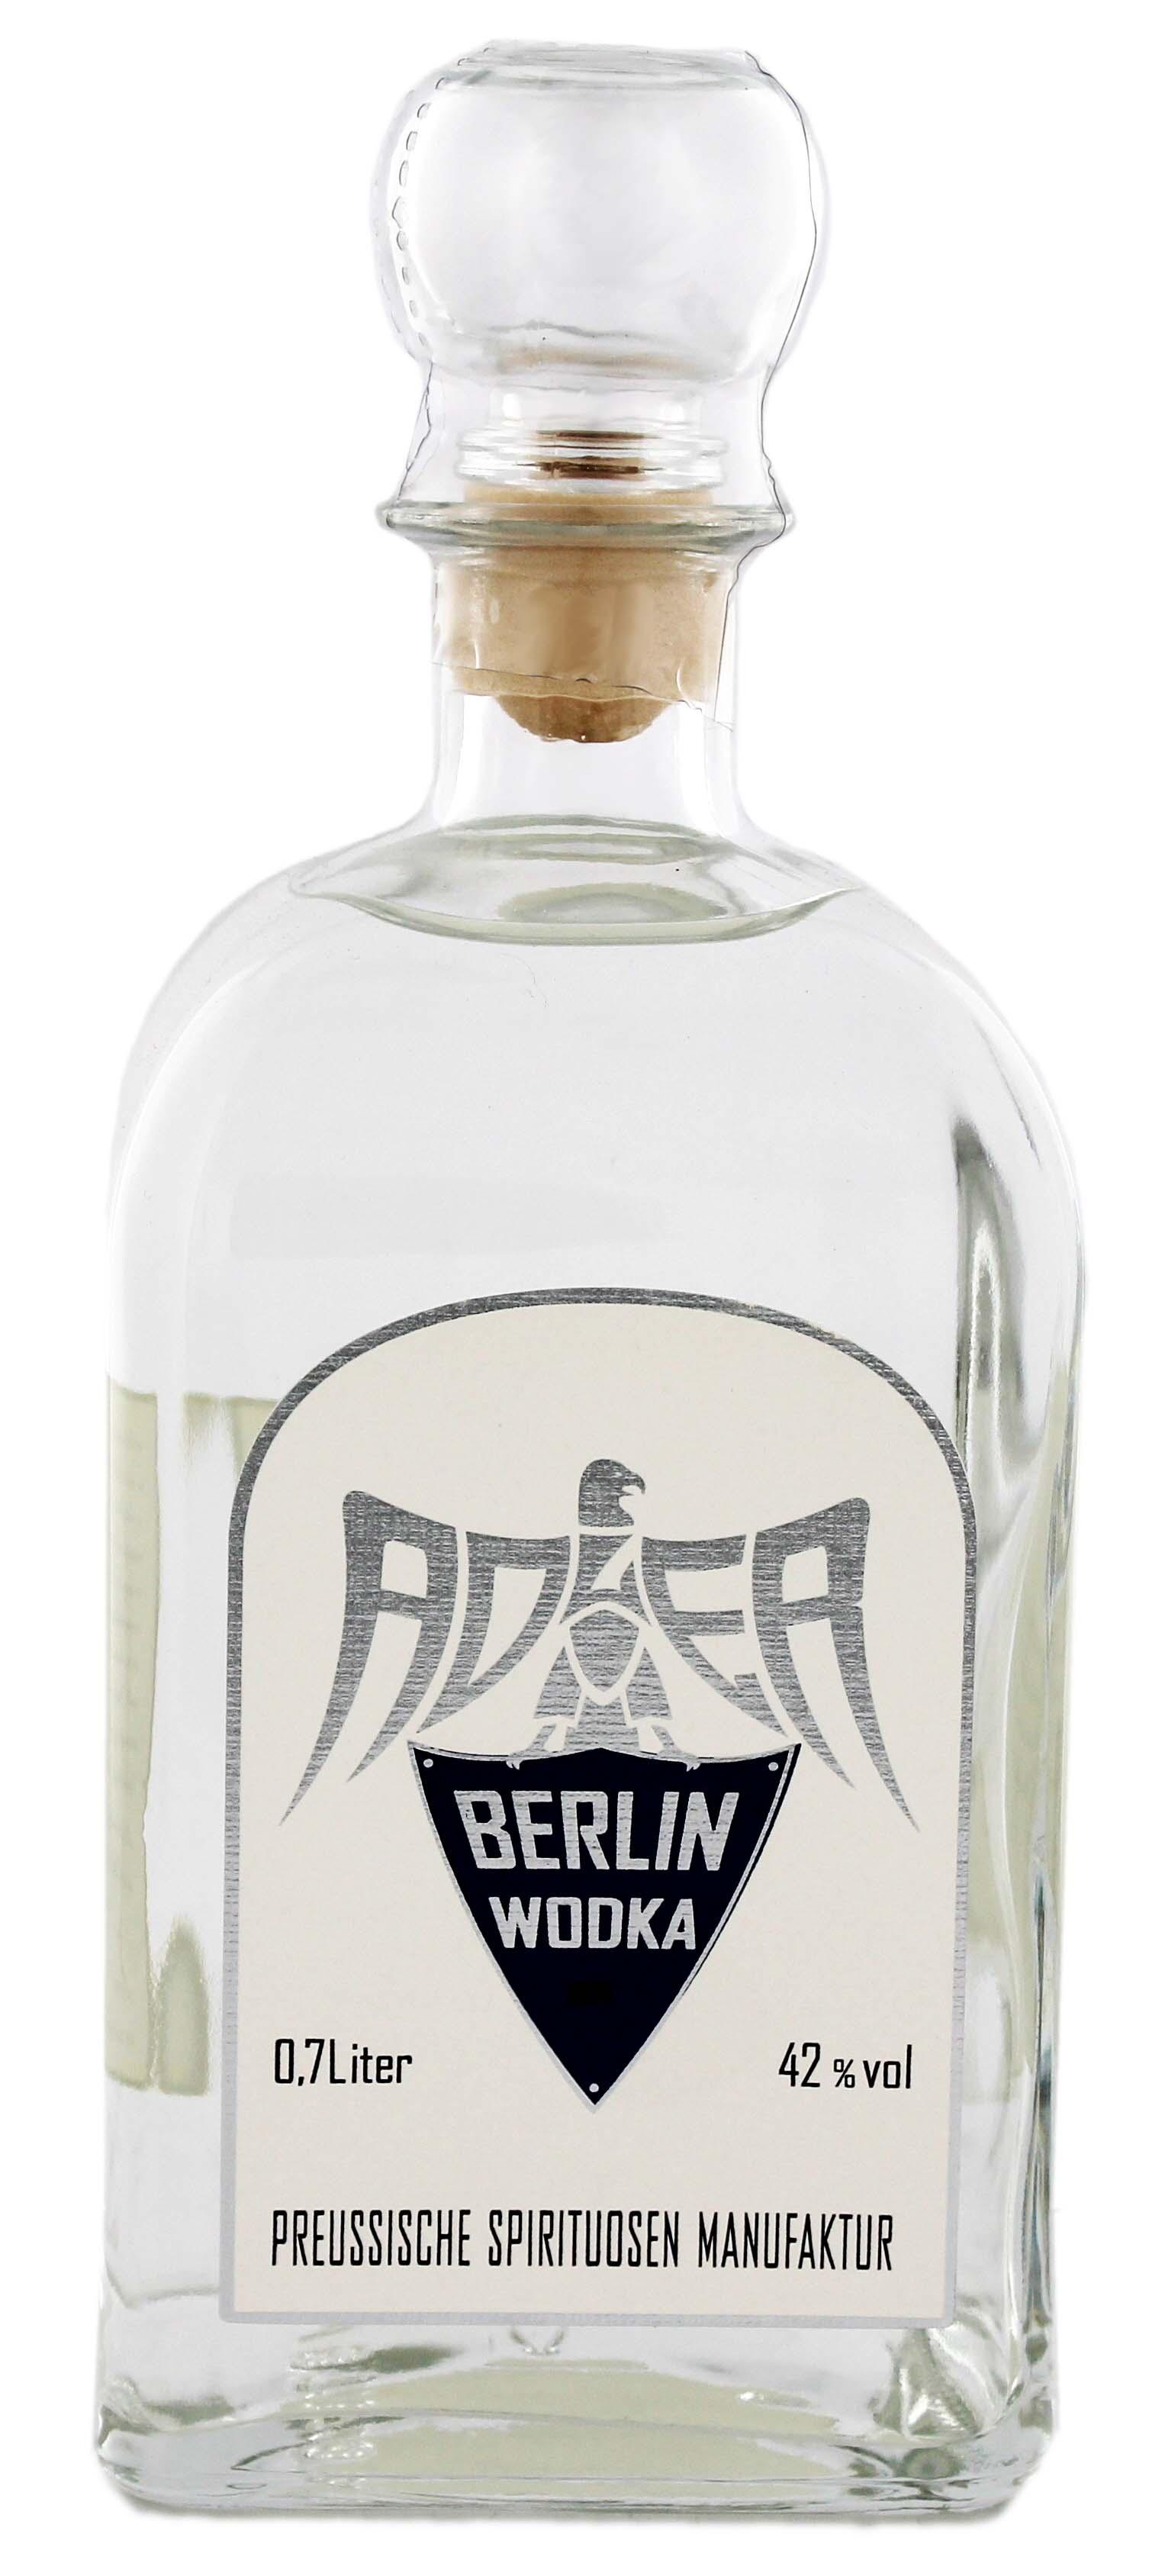 Adler Berlin Wodka 0,7L